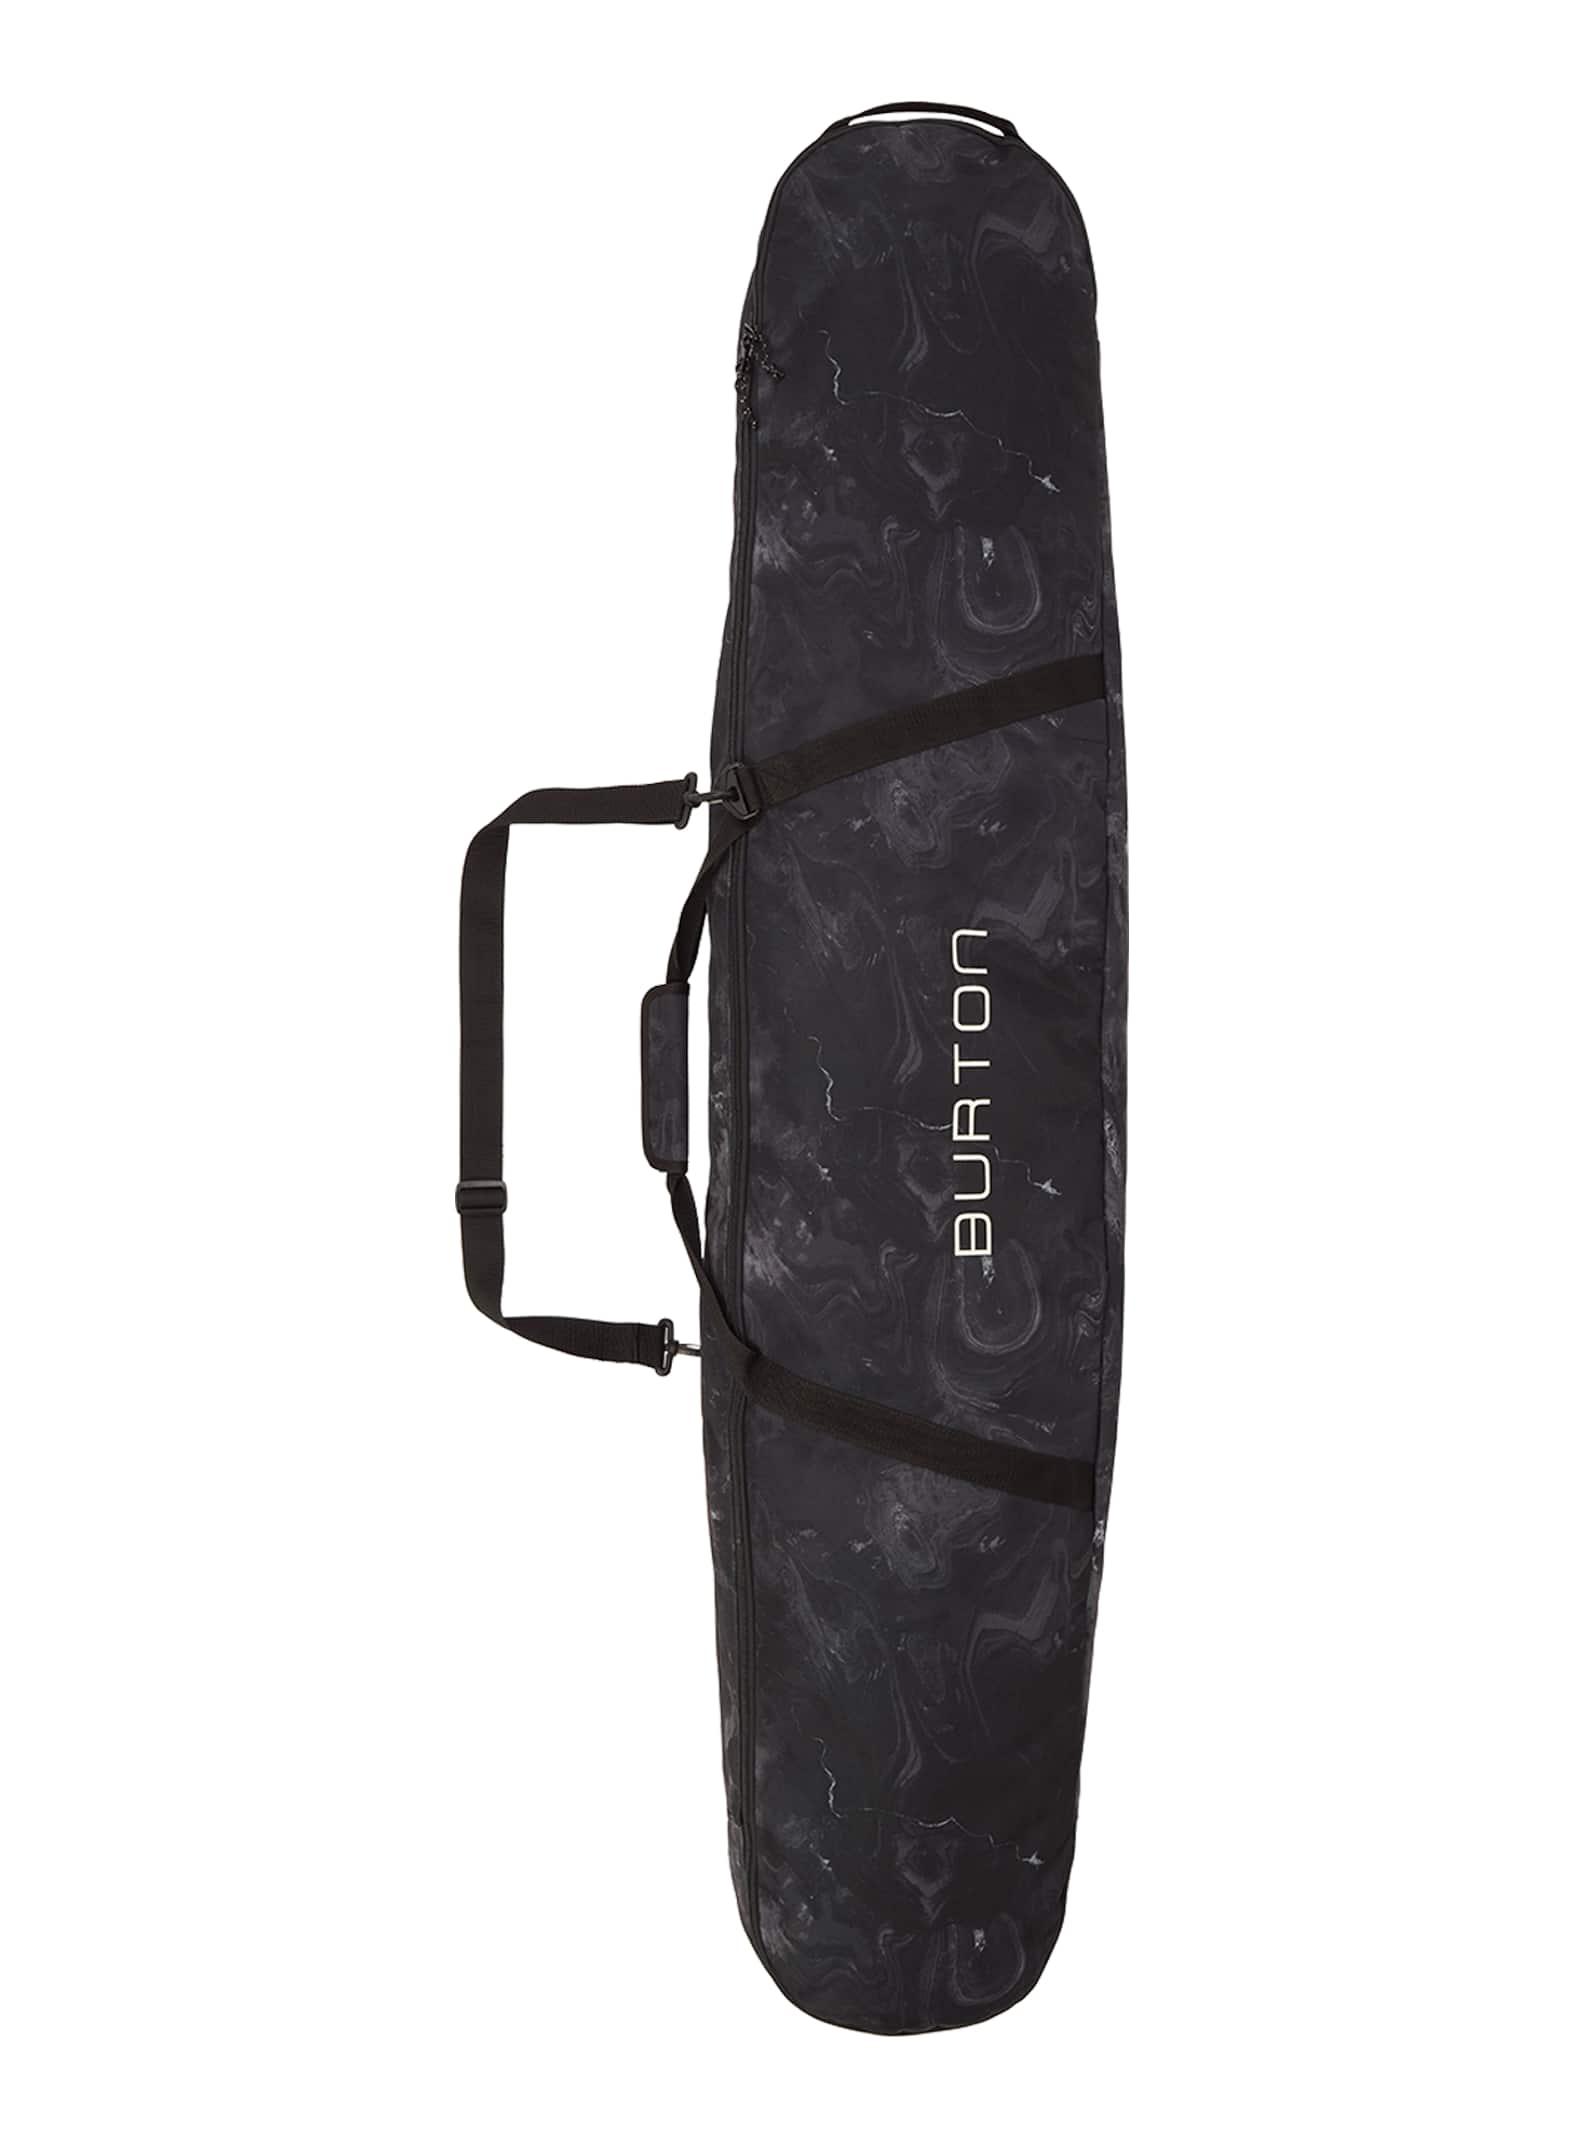 Snowboarding Gear Bags Burton Snowboards Nz